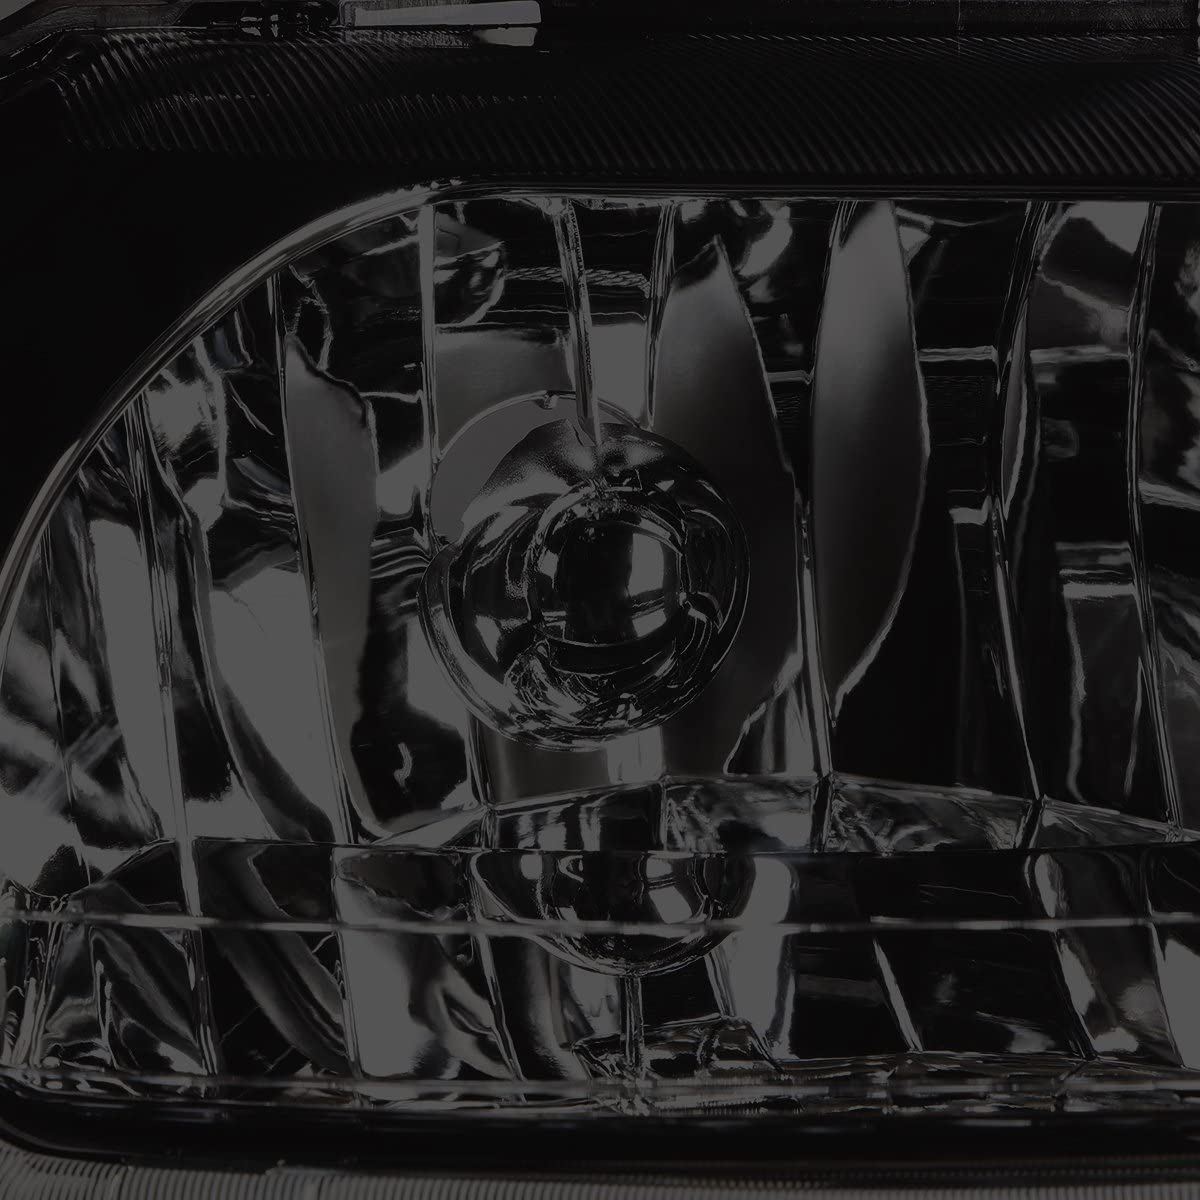 DNA Motoring HL-LB-FM99-CH-CL1 Chrome Housing Clear Corner LED Headlight For 99-04 Ford Mustang